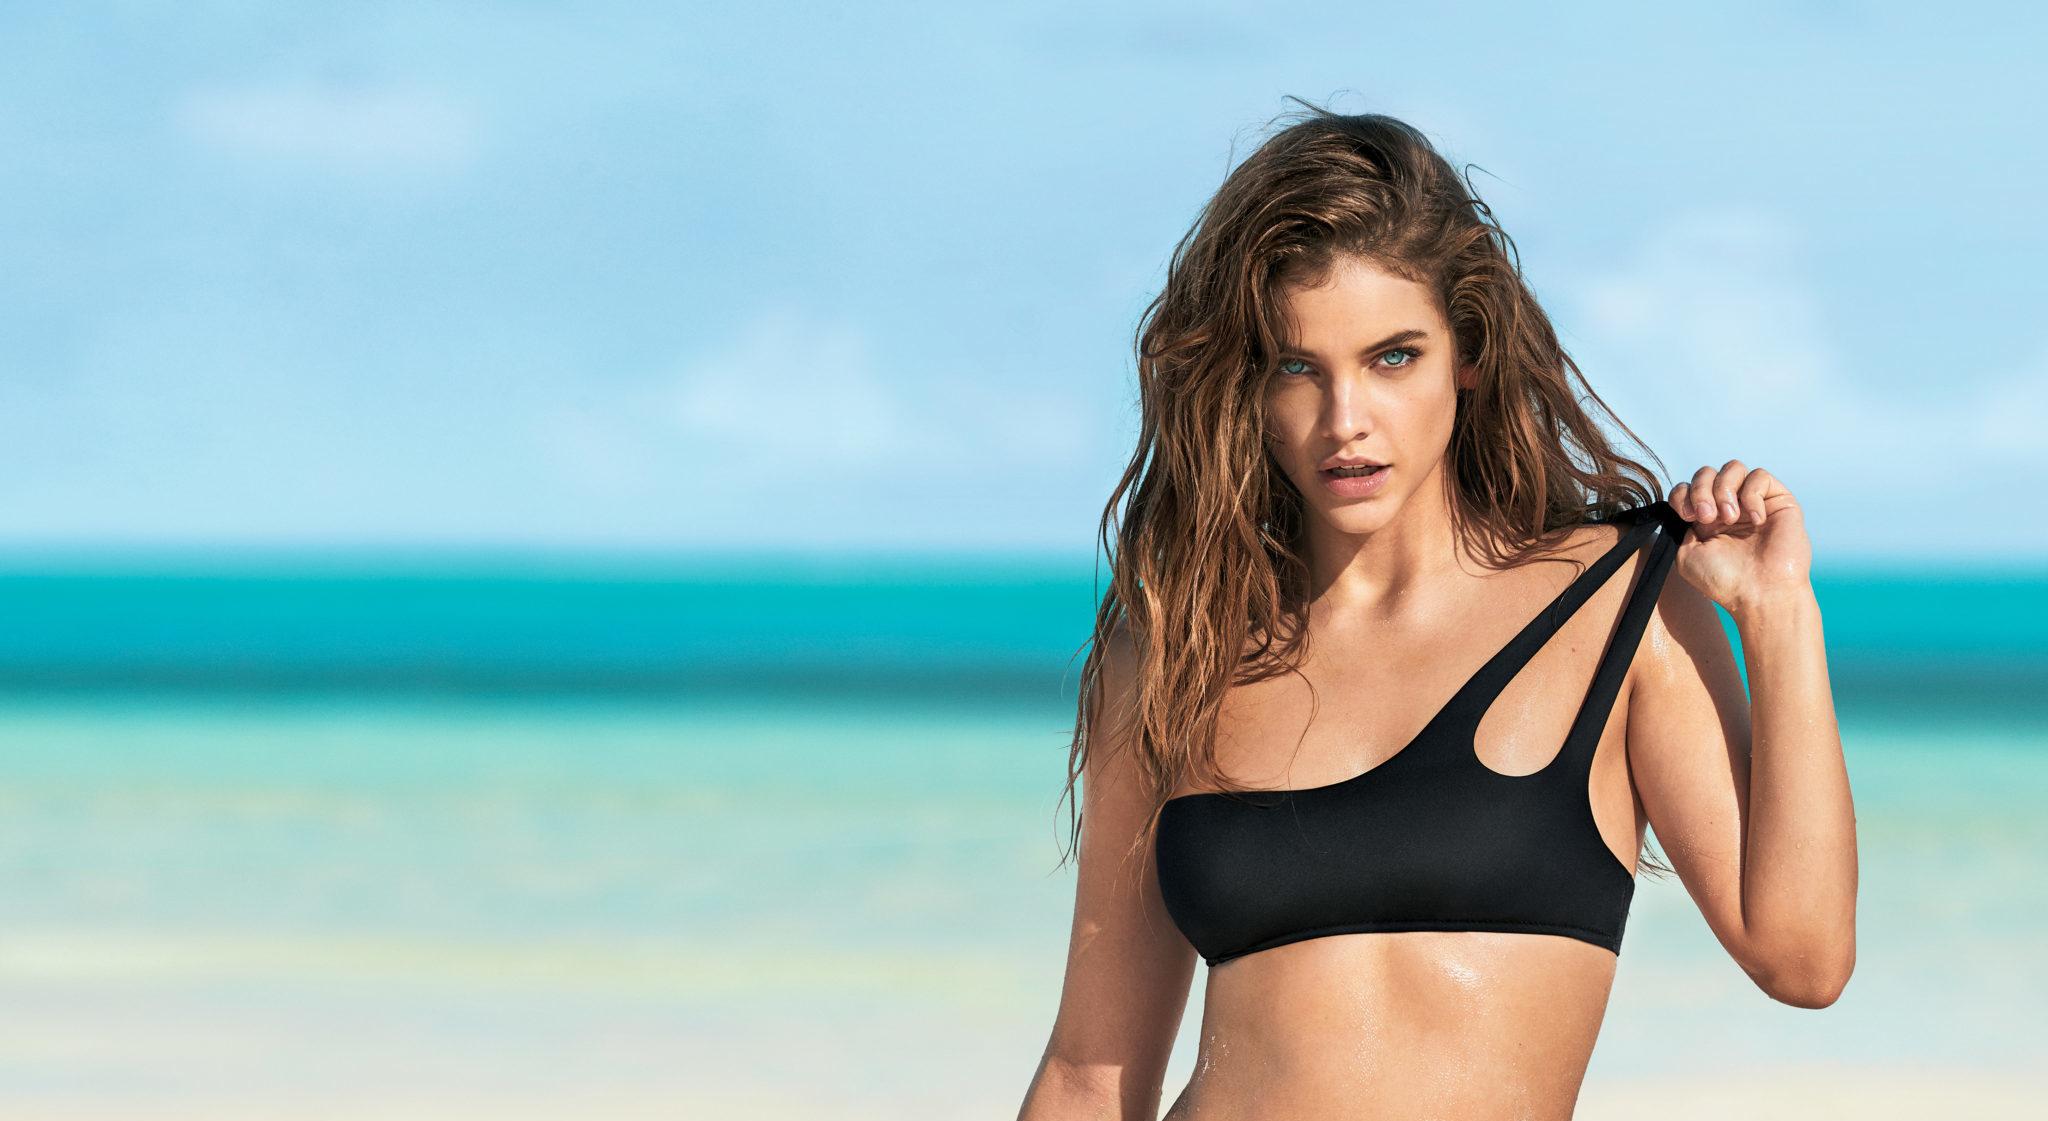 11 beachwear trends για να είσαι η θεά της παραλίας Οι μέρες που τα μαγιό είναι το μόνο κομμάτι της γκαρνταρόμπας μας που μας απασχολεί, είναι ήδη εδώ. Επισκεφτήκαμε τα καταστήματα Calzedonia και ανακαλύψαμε σέξυ μπικίνι, θηλυκά ολόσωμα, μίνιμαλ σχέδια, και καυτά prints για να γράψουμε τις ωραιότερες ιστορίες μας στην άμμο.